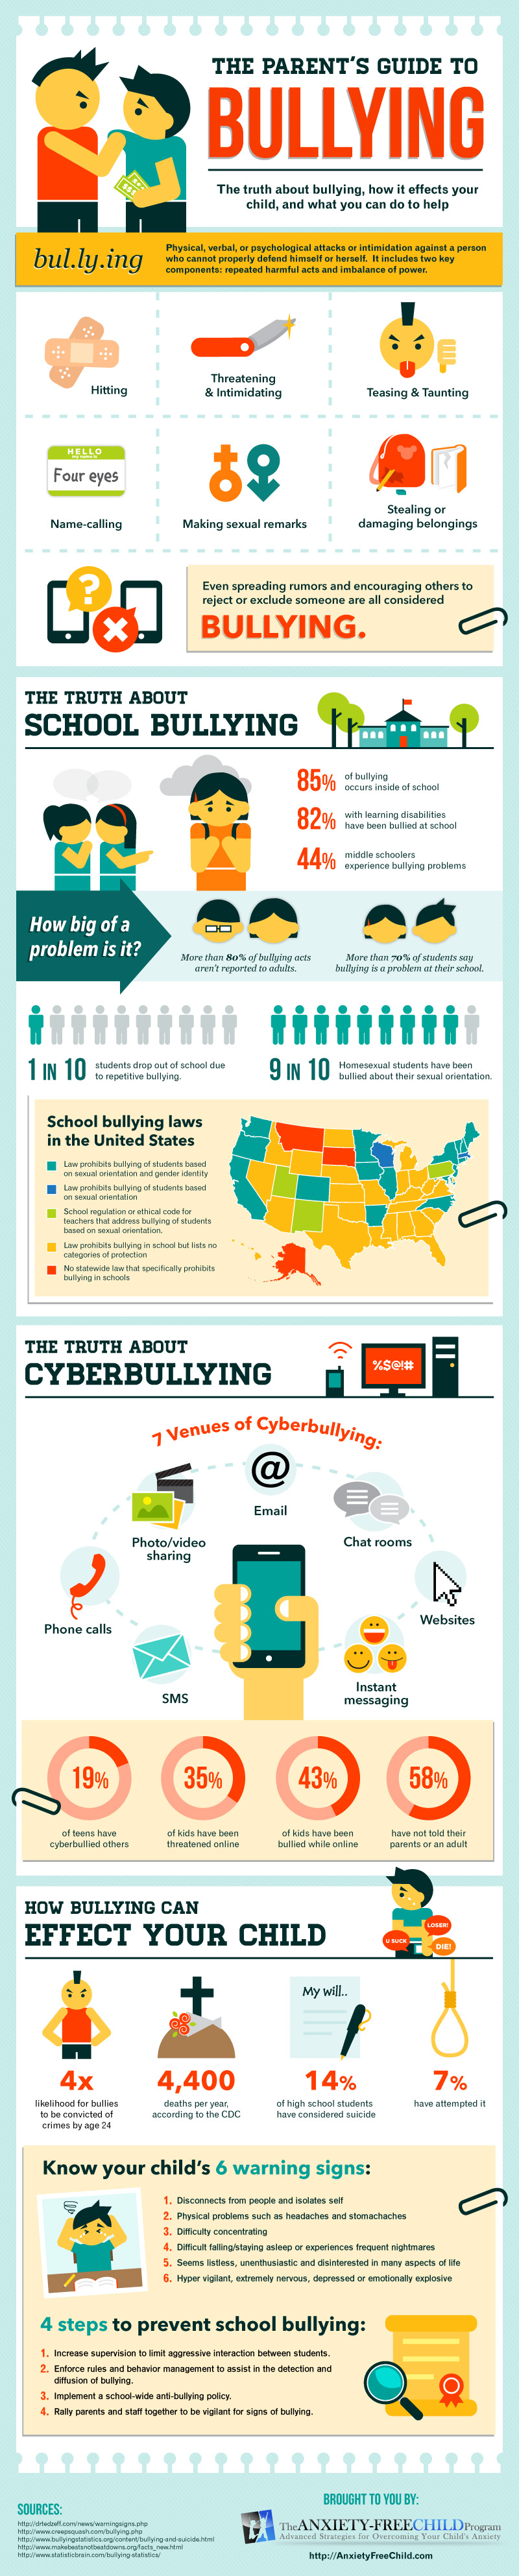 Bullycide Statistics in School